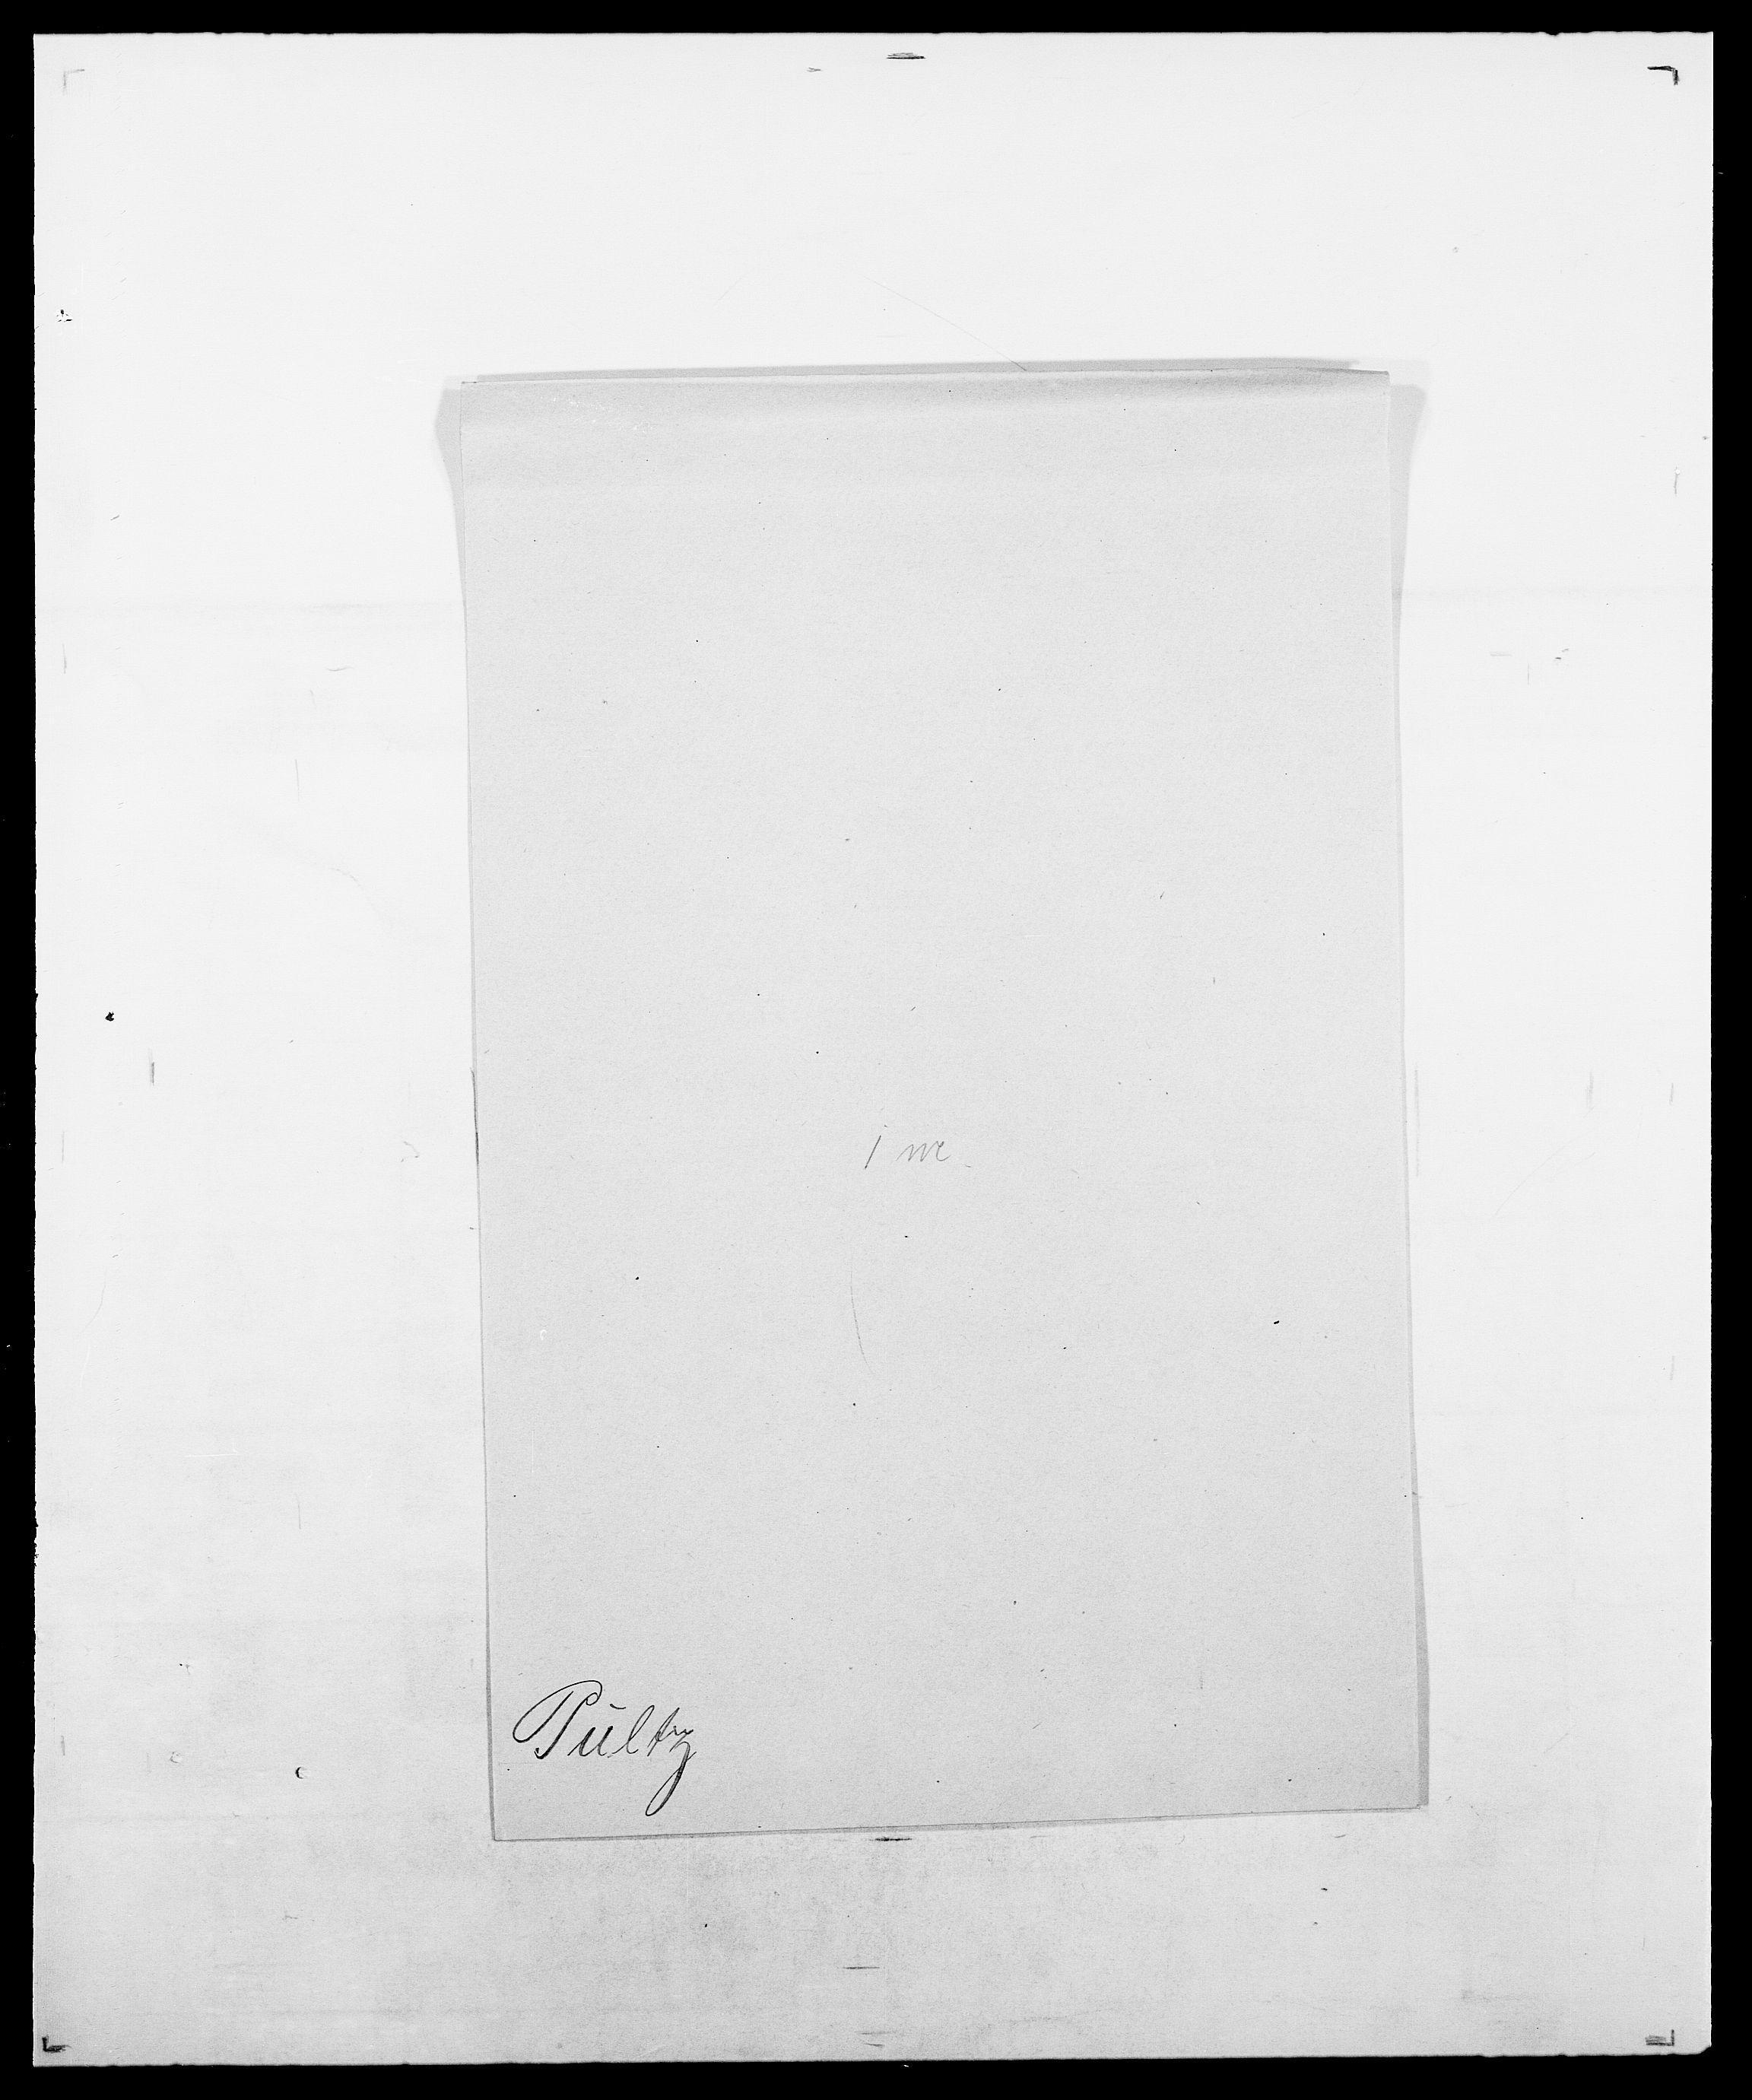 SAO, Delgobe, Charles Antoine - samling, D/Da/L0031: de Place - Raaum, s. 441